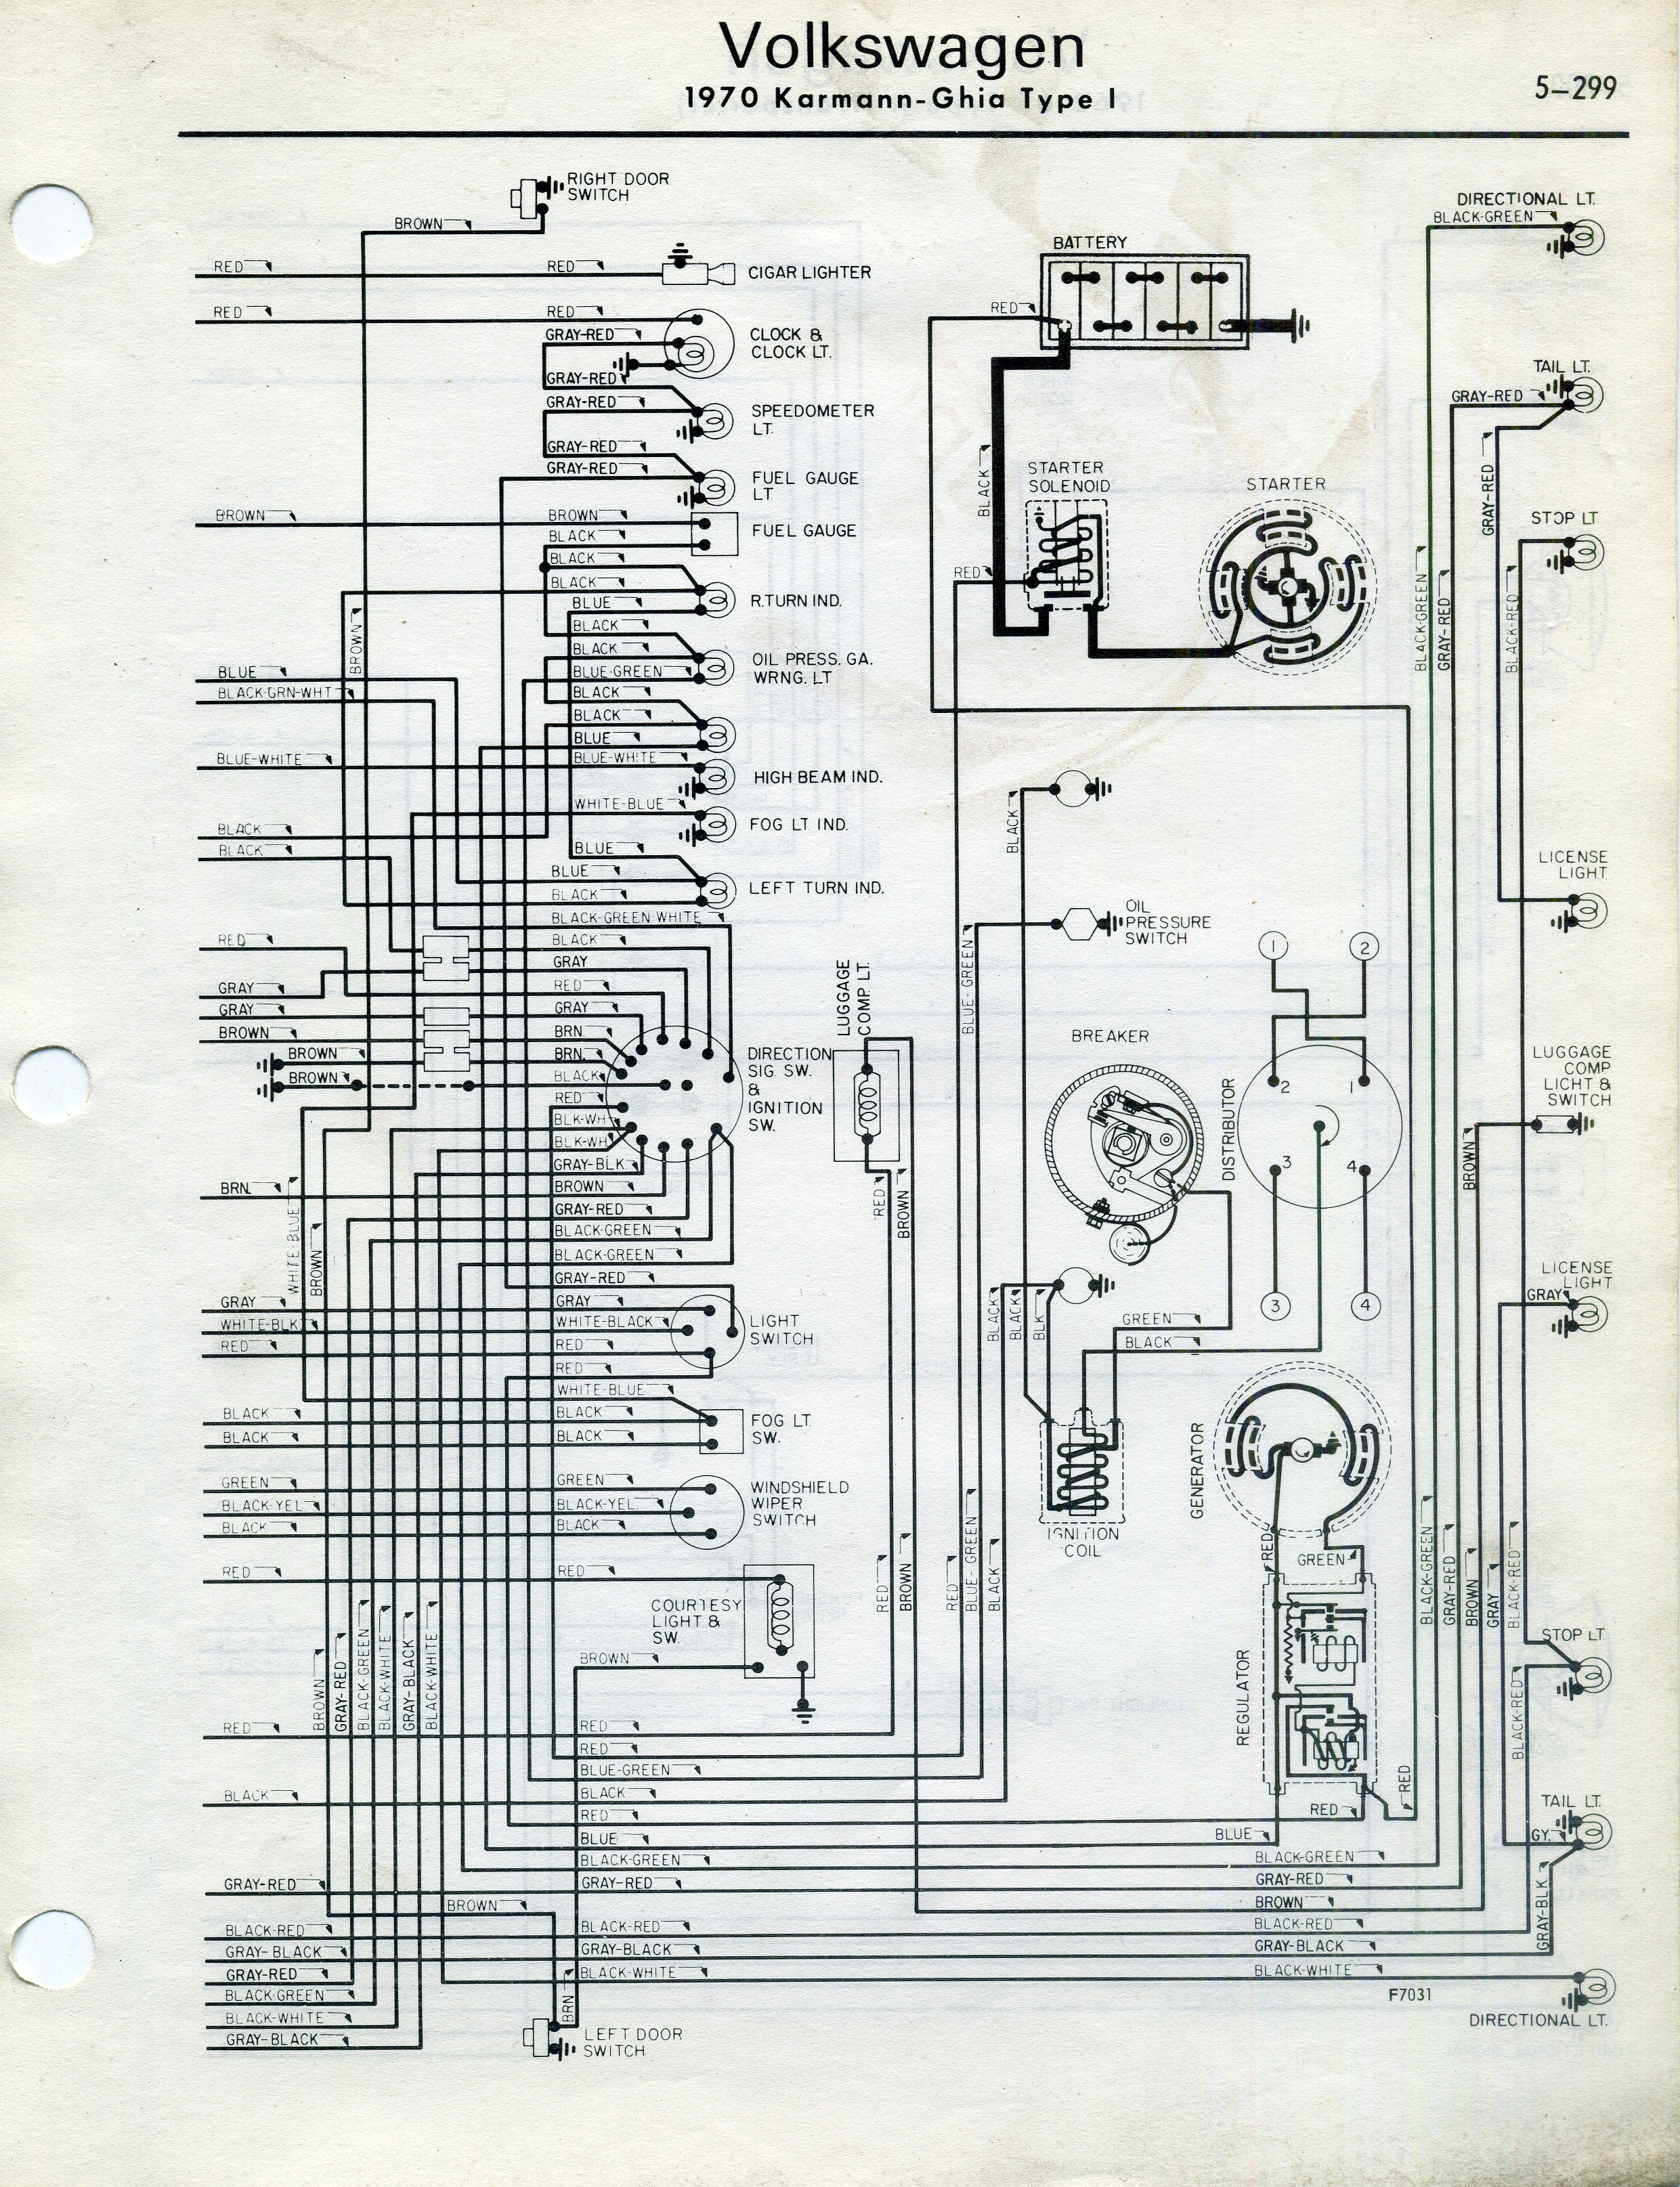 1966 Wiring Diagram Thesamba Com Karmann Ghia Wiring Diagrams